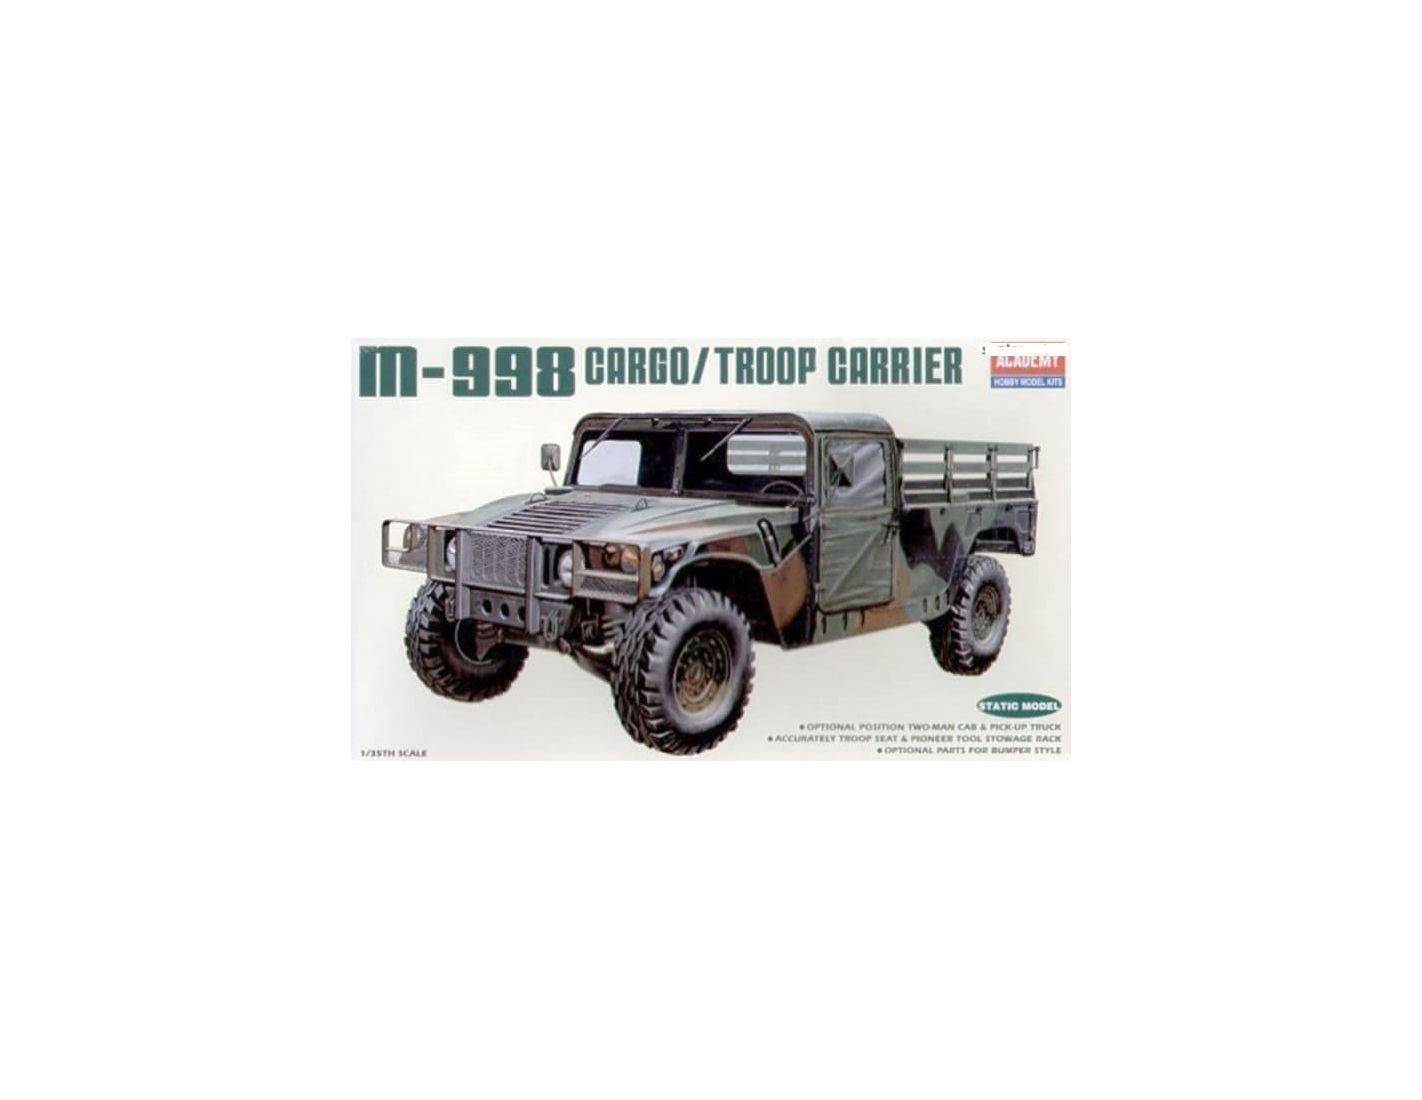 ACADEMY 1362 M-998 CARGO TROOP CARRIER 1:35 Kit Modellino